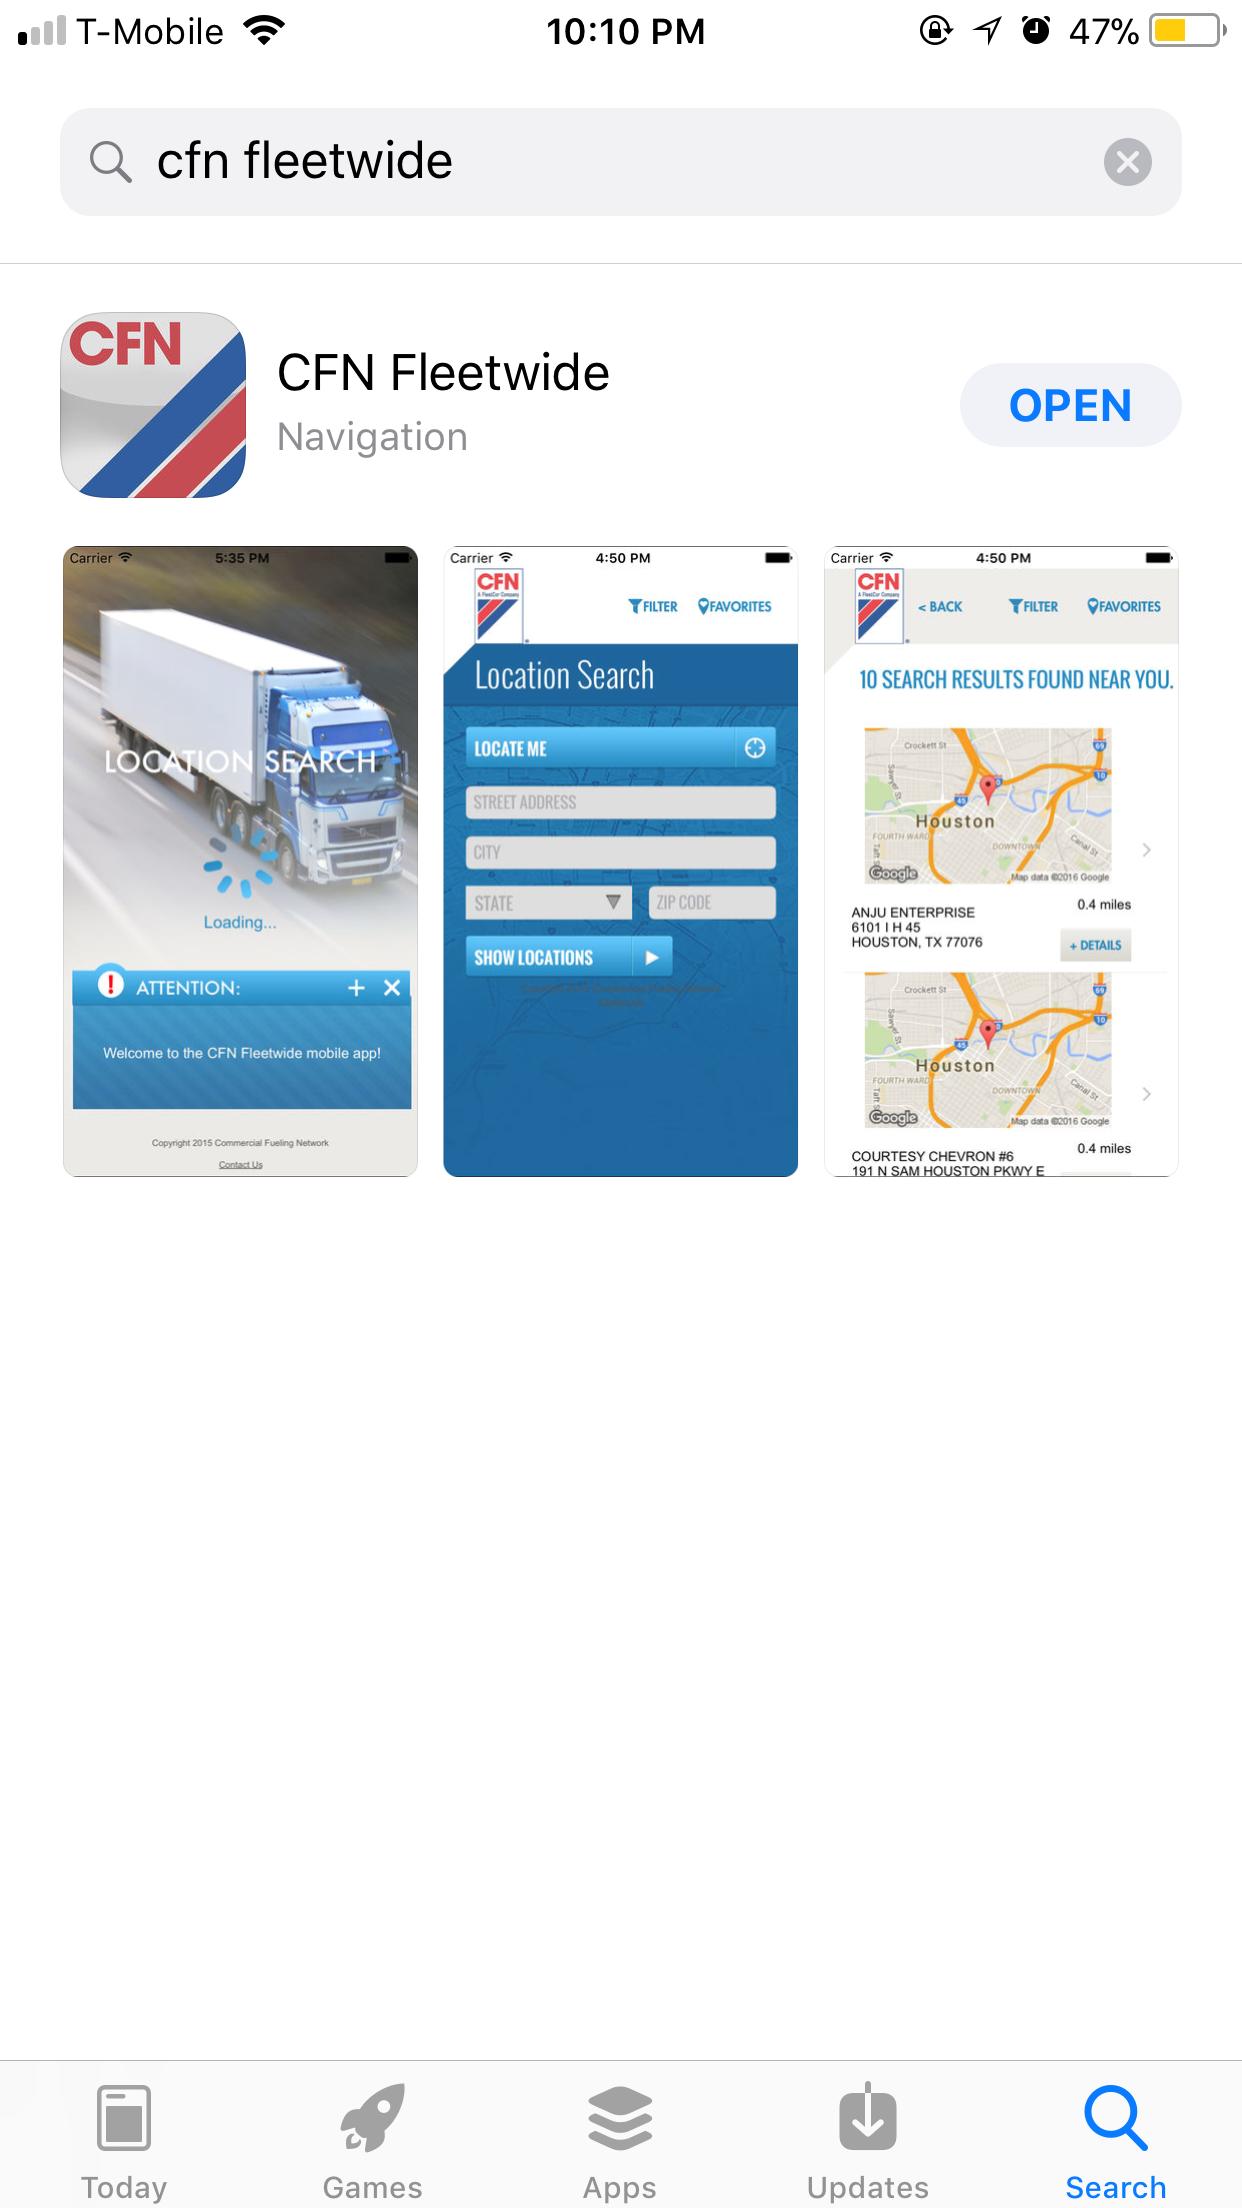 CFN Fleetwide iPhone App